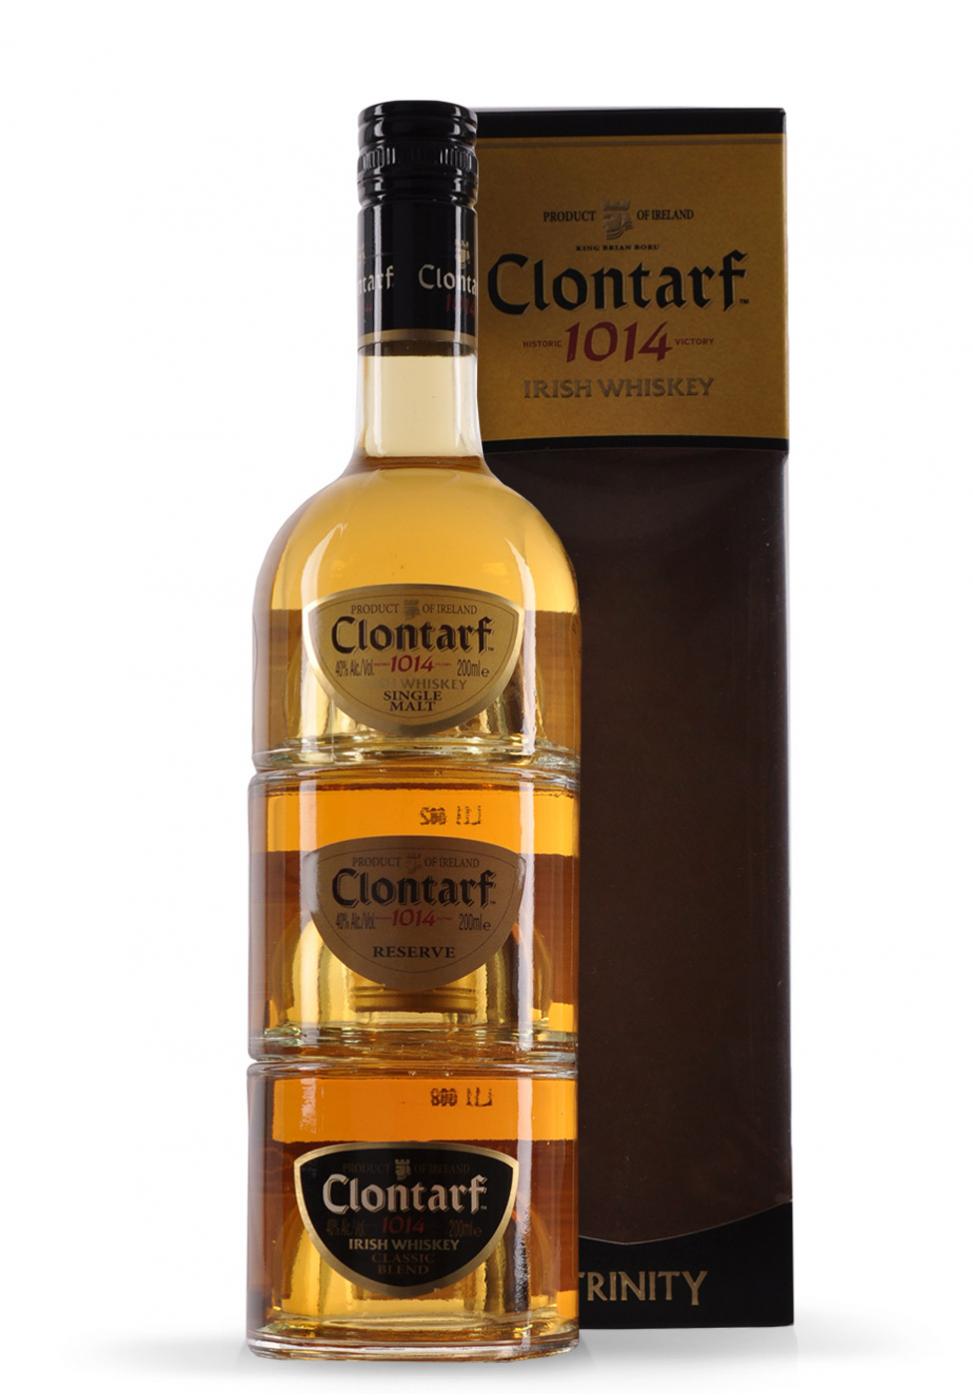 Whisky Clontarf Irish Trinity (3 x 200ml)